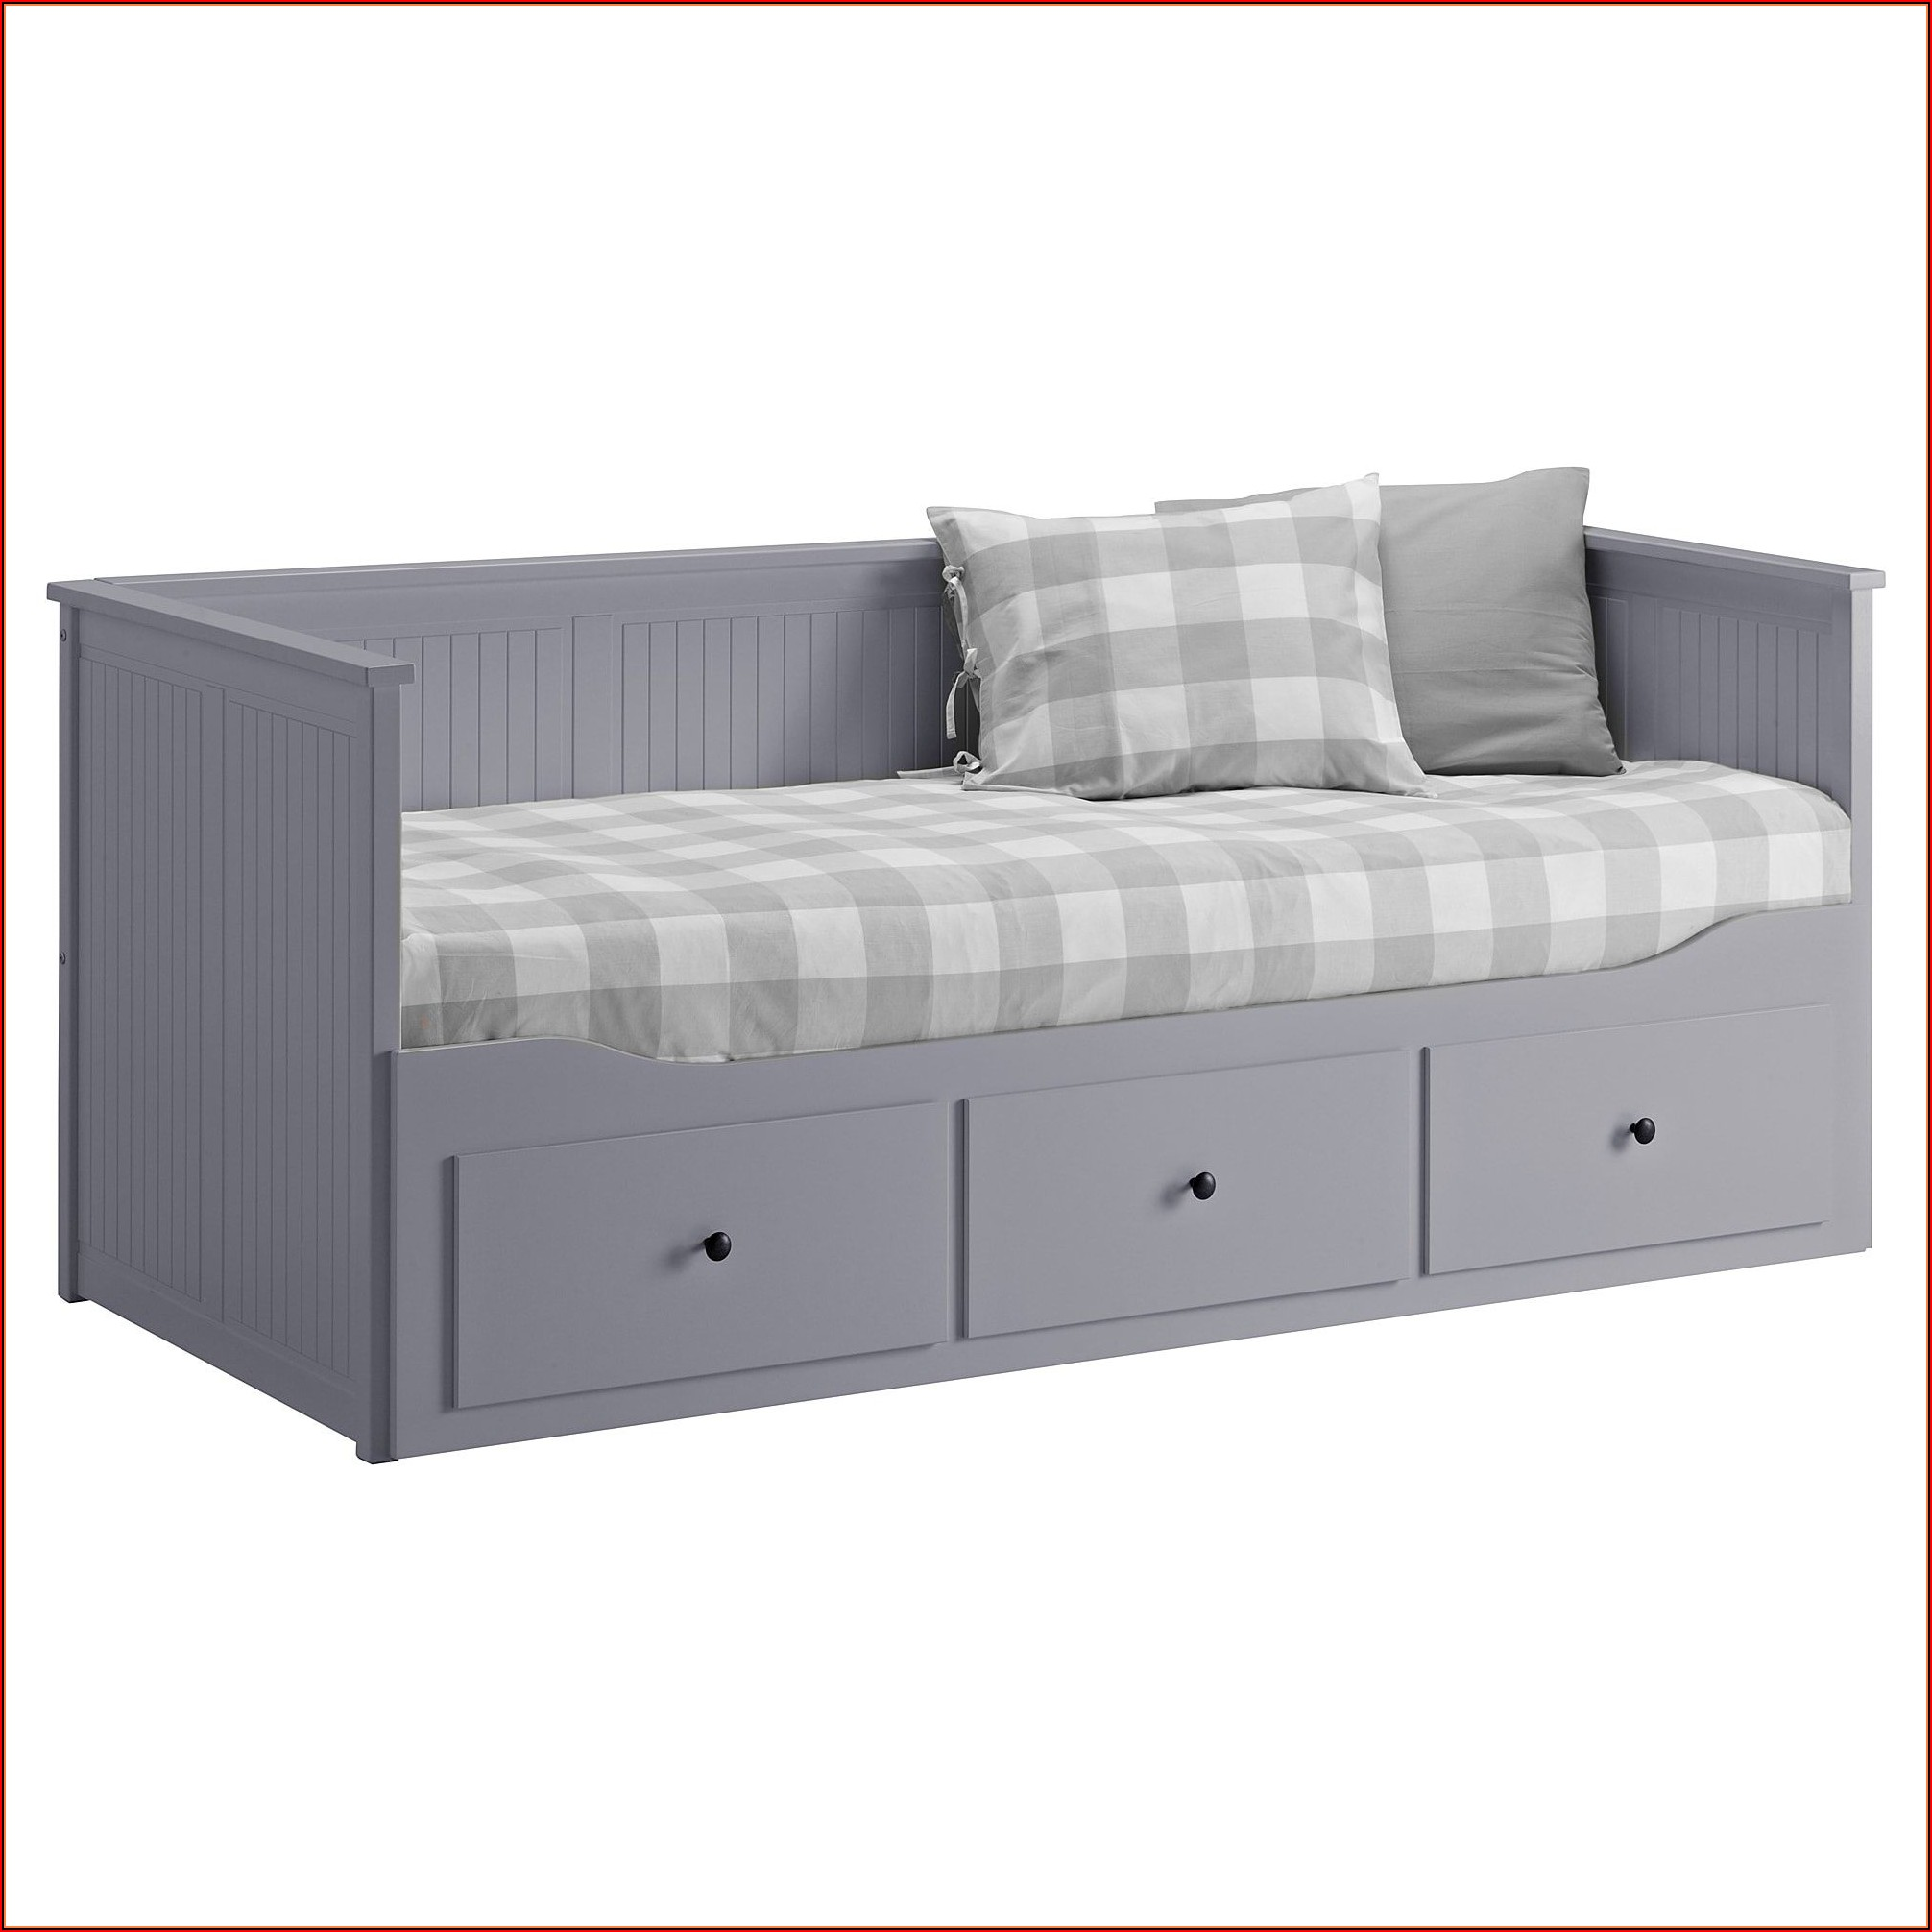 Ikea Hemnes Schlafzimmerserie